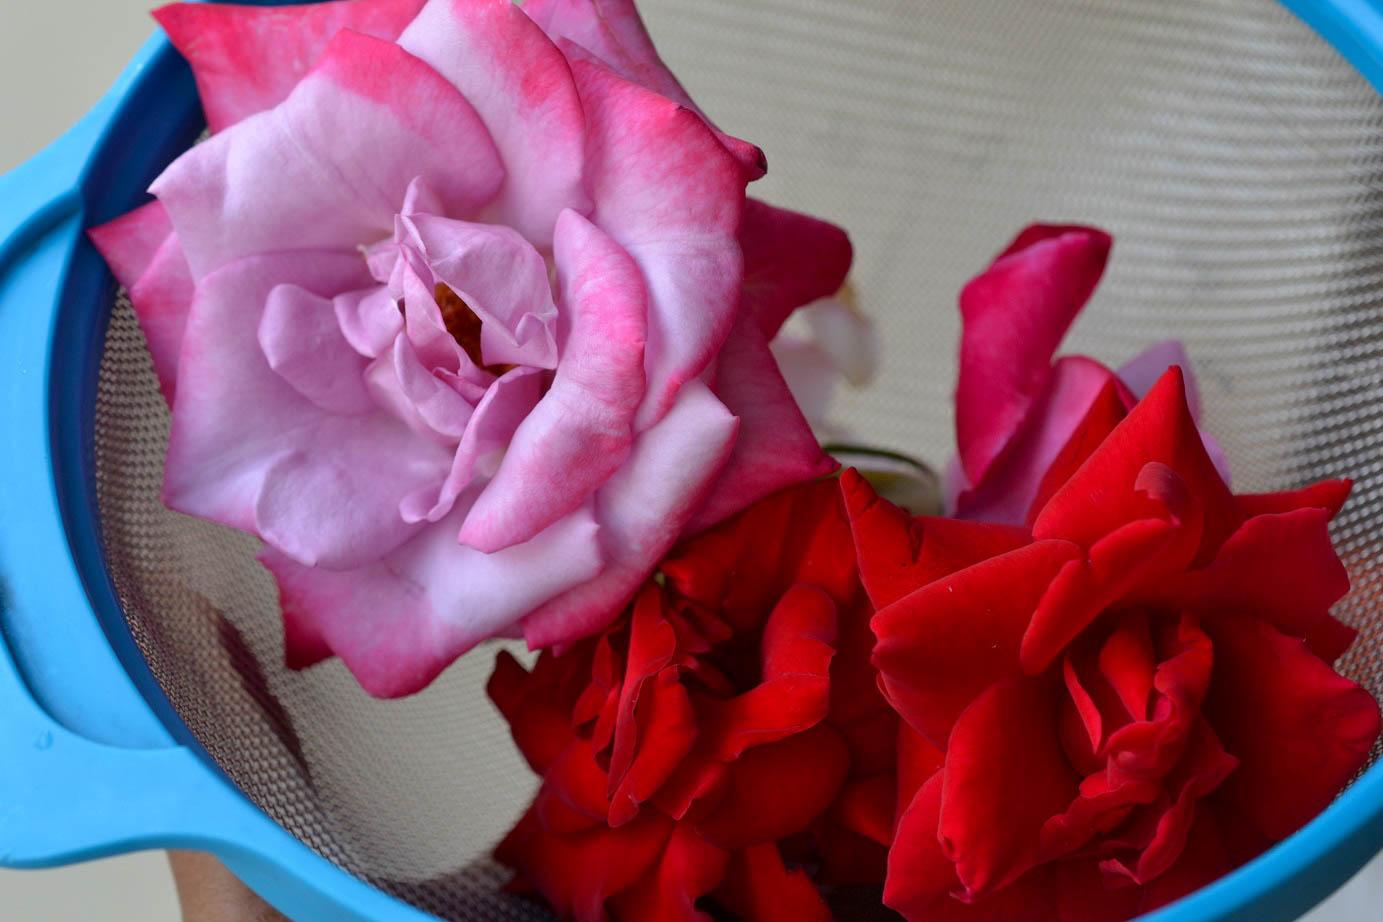 Greedy Girl : Vegan rose petal ice-cream